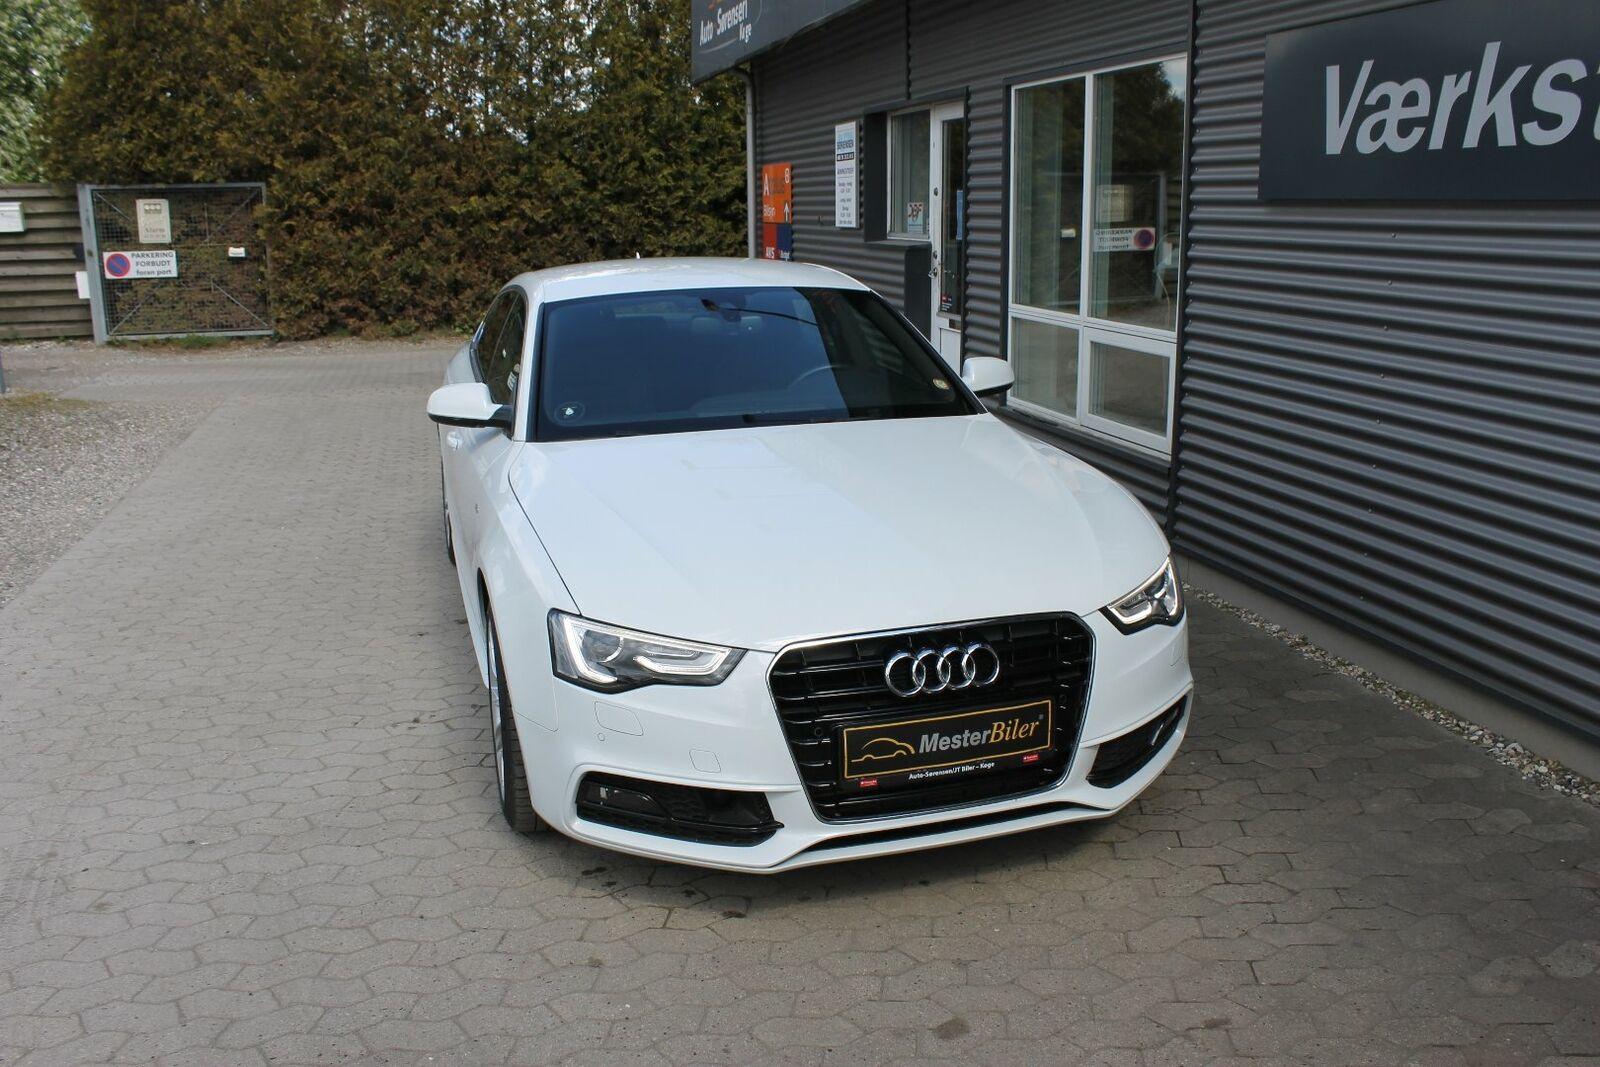 Audi A5 1,8 TFSi 170 S-line SB 5d - 259.800 kr.